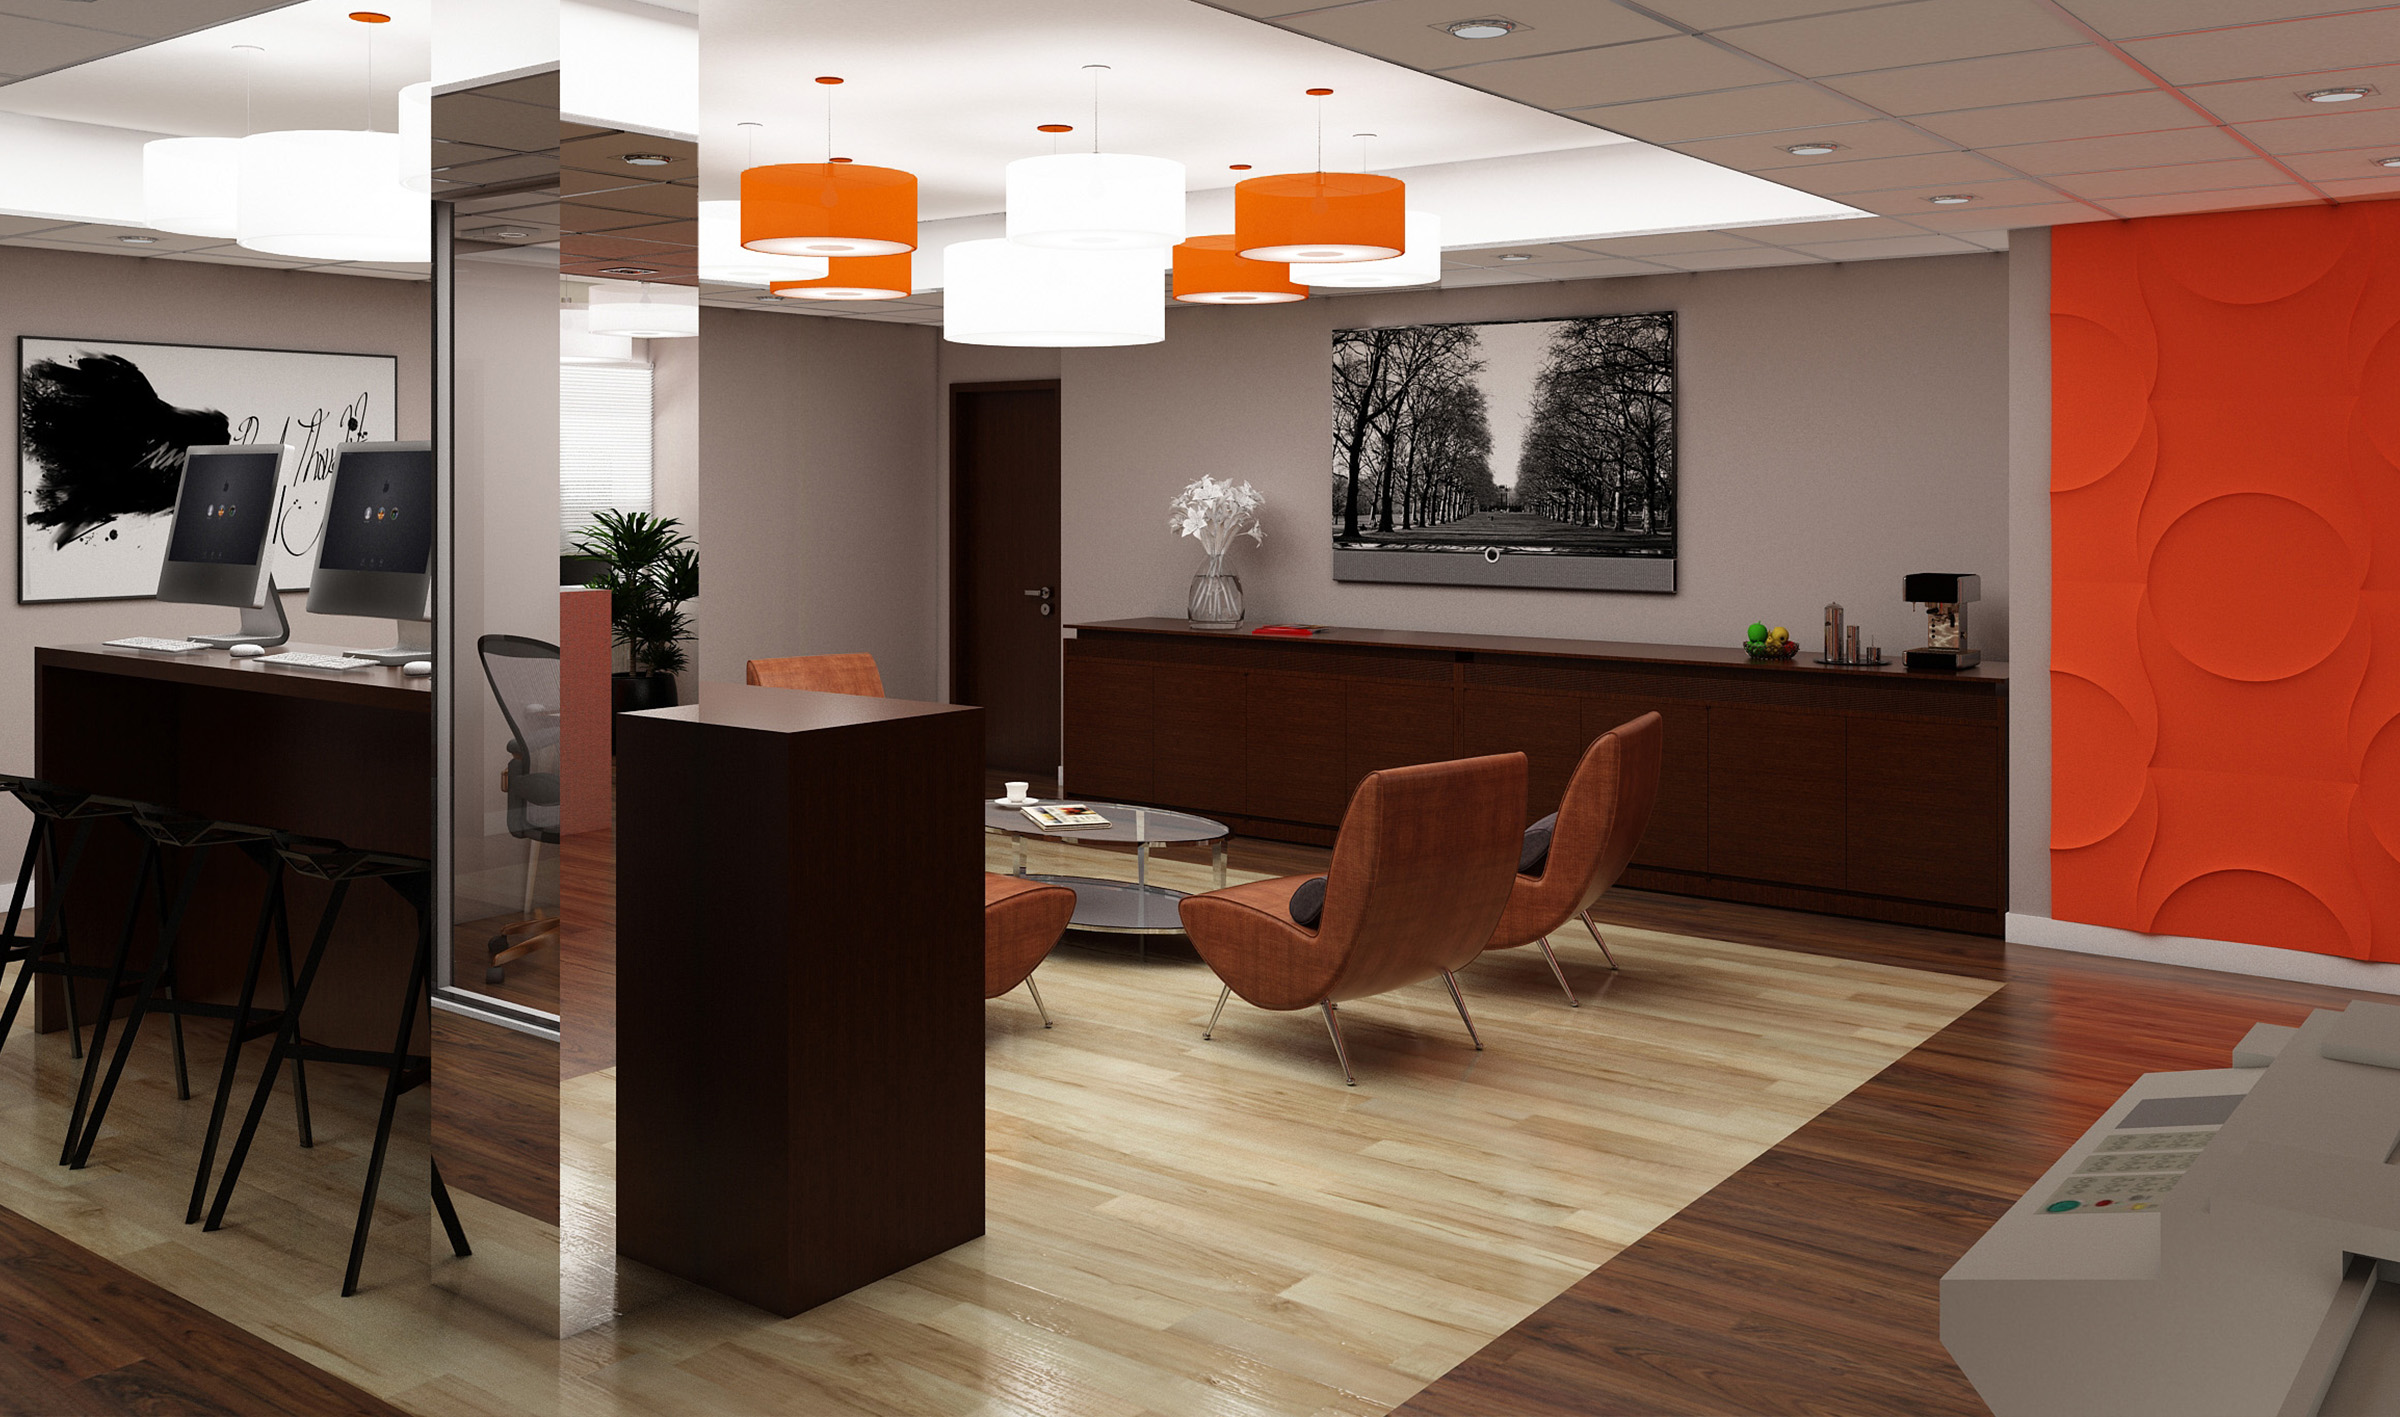 m-office-2